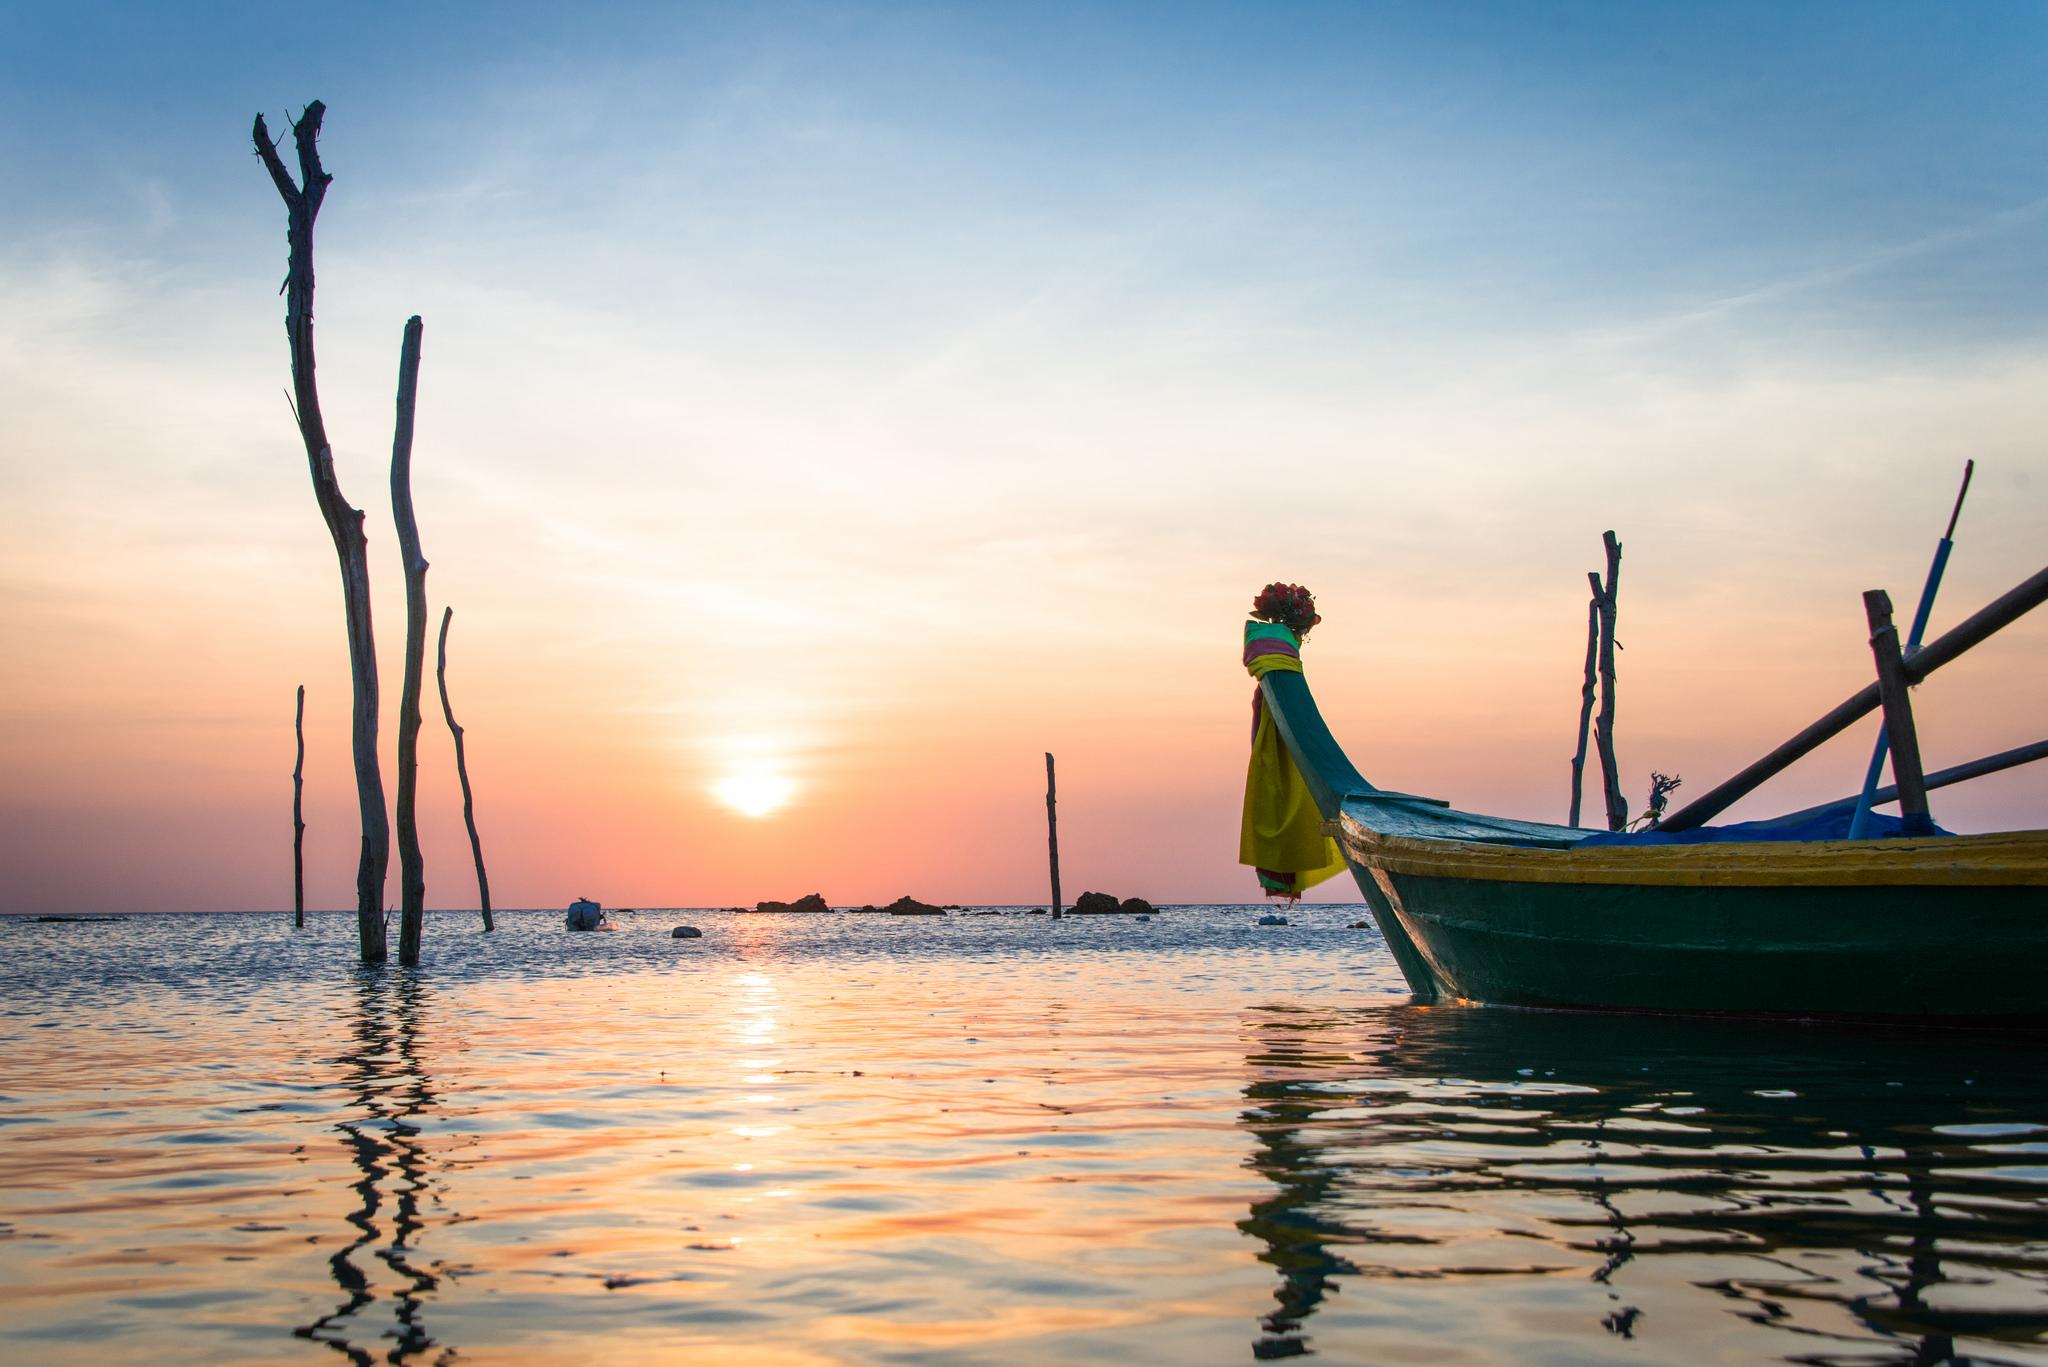 Sunset - Ko Lanta / Thailand, Rushen January 29, 2014